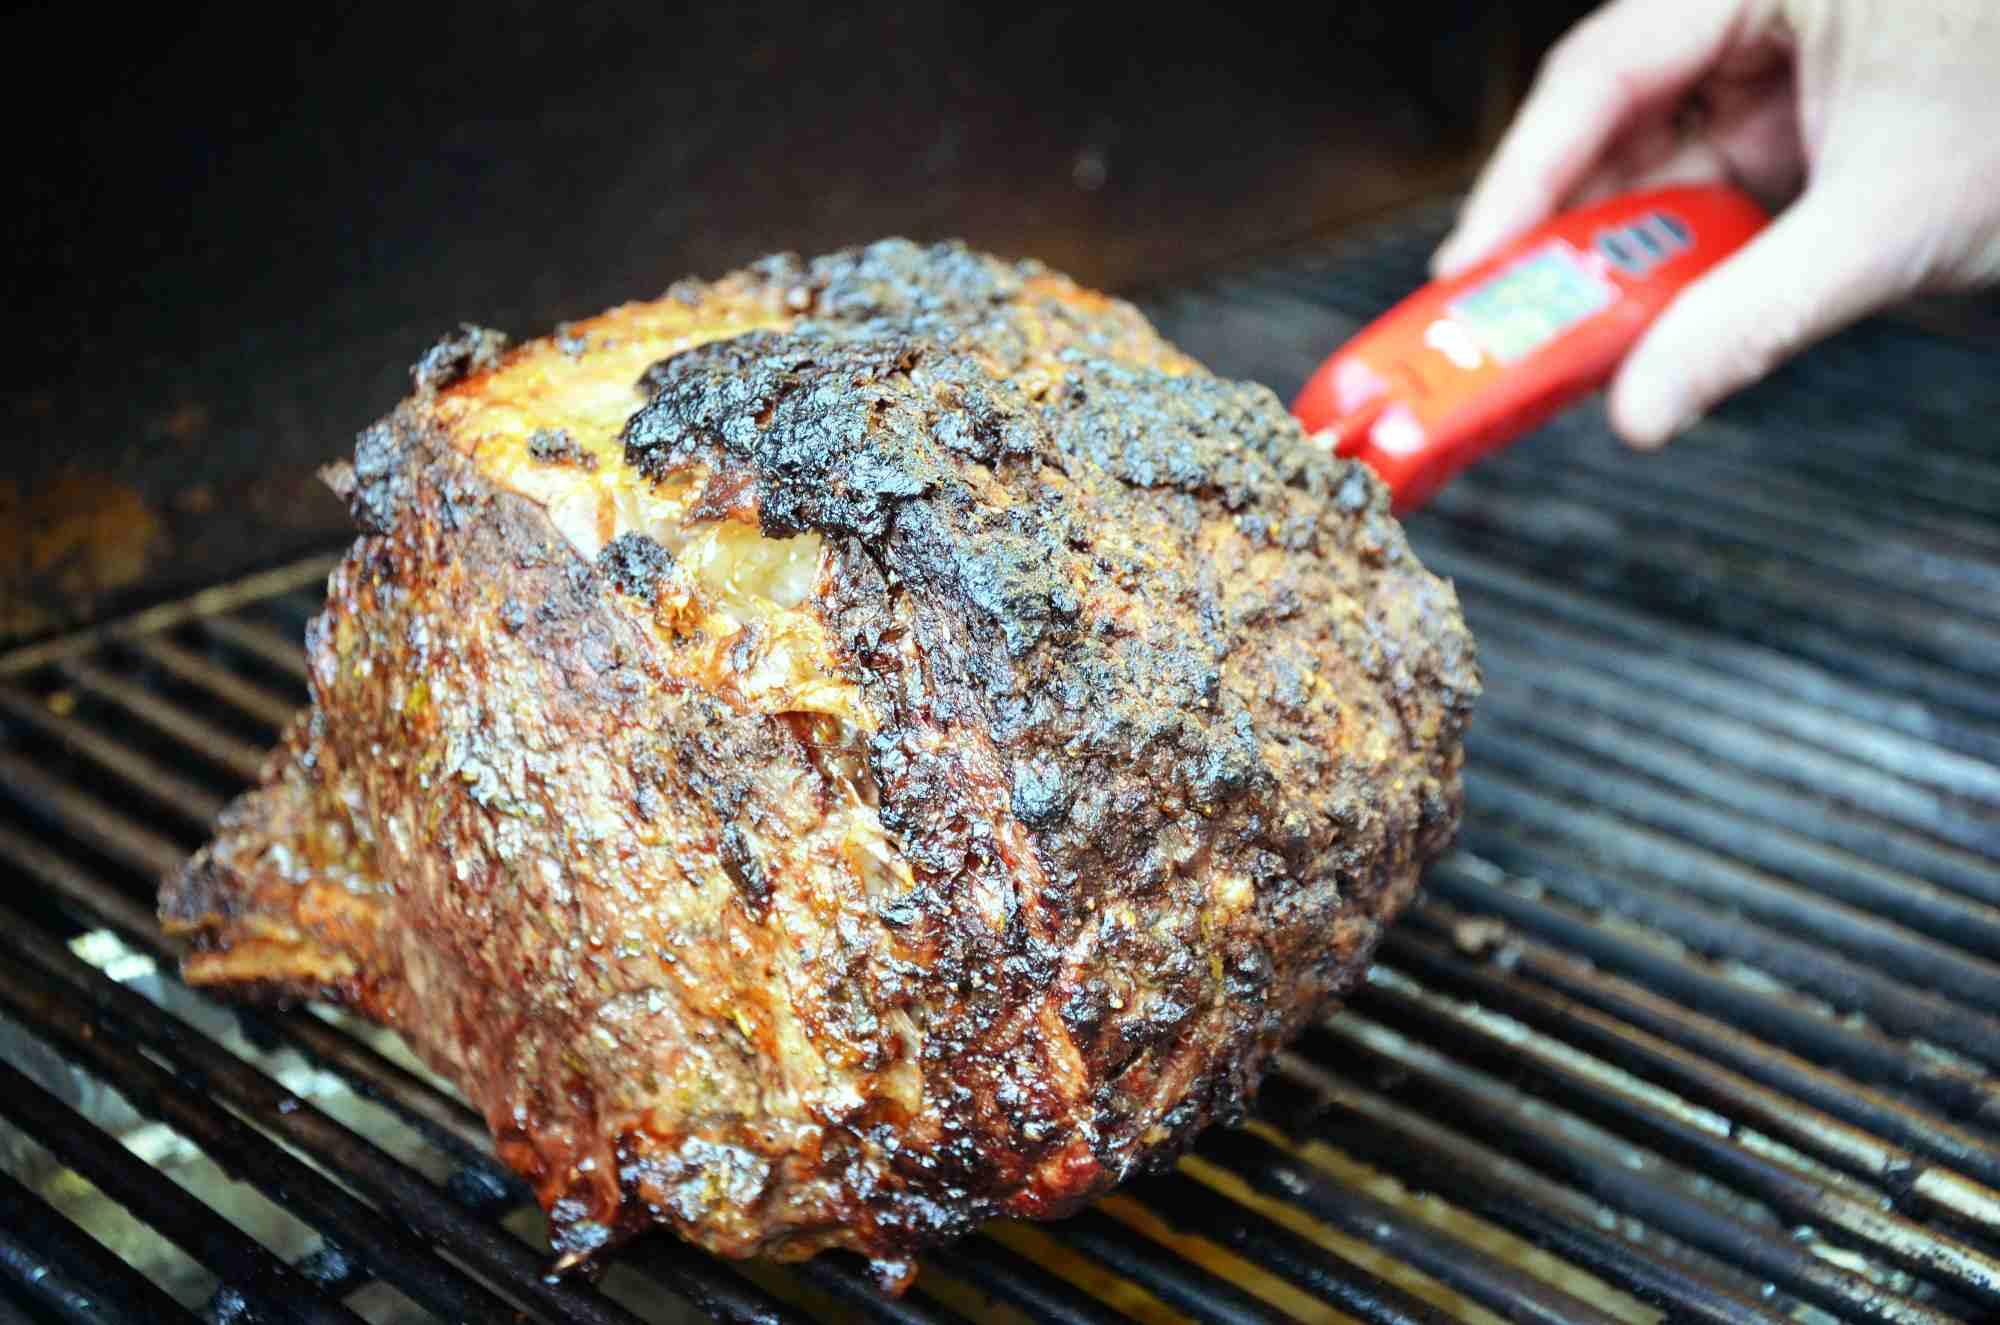 Rib roast temperature check